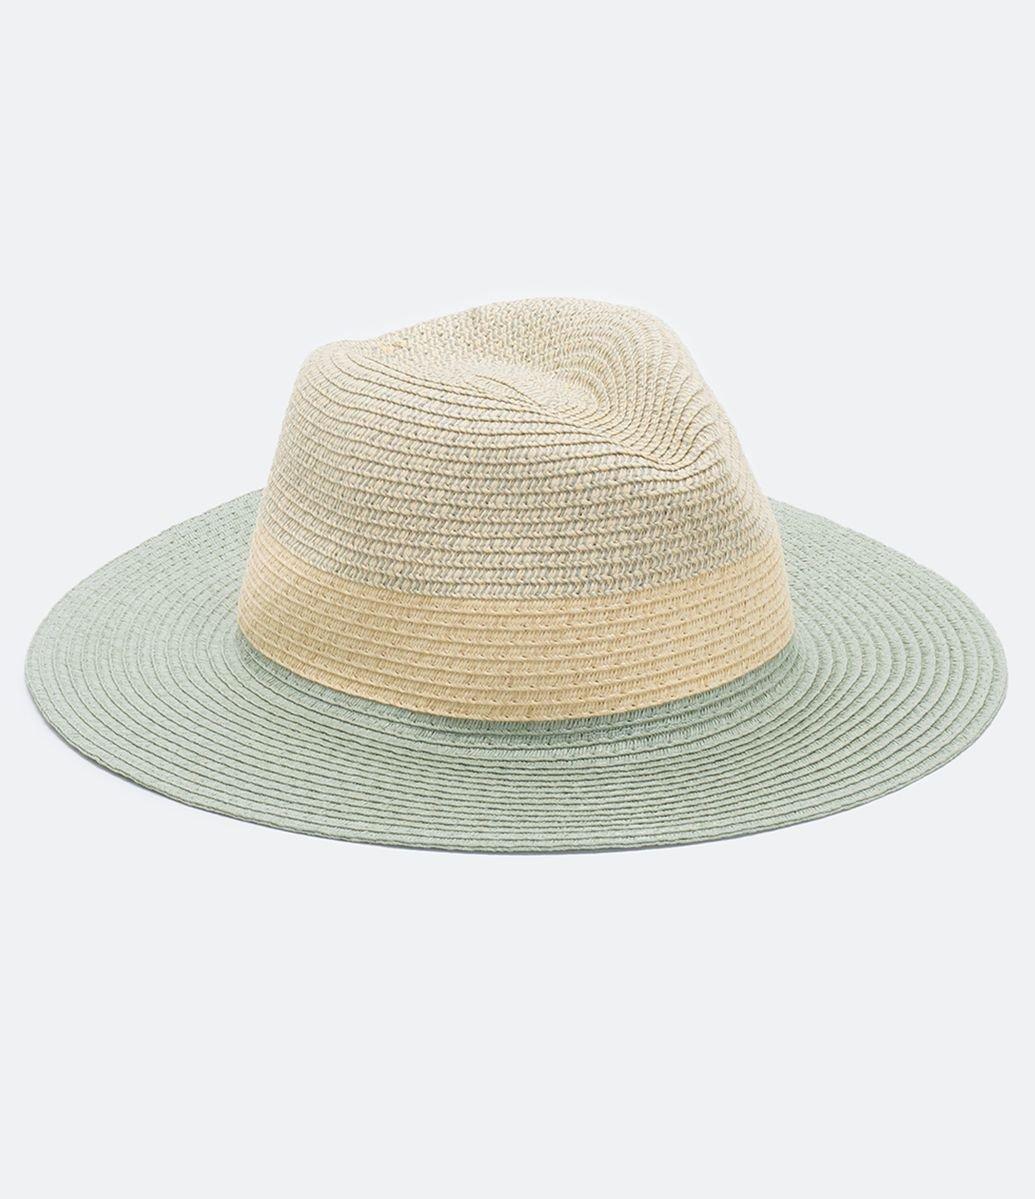 9970aba555275 Chapéu de Palha Panamá - Renner